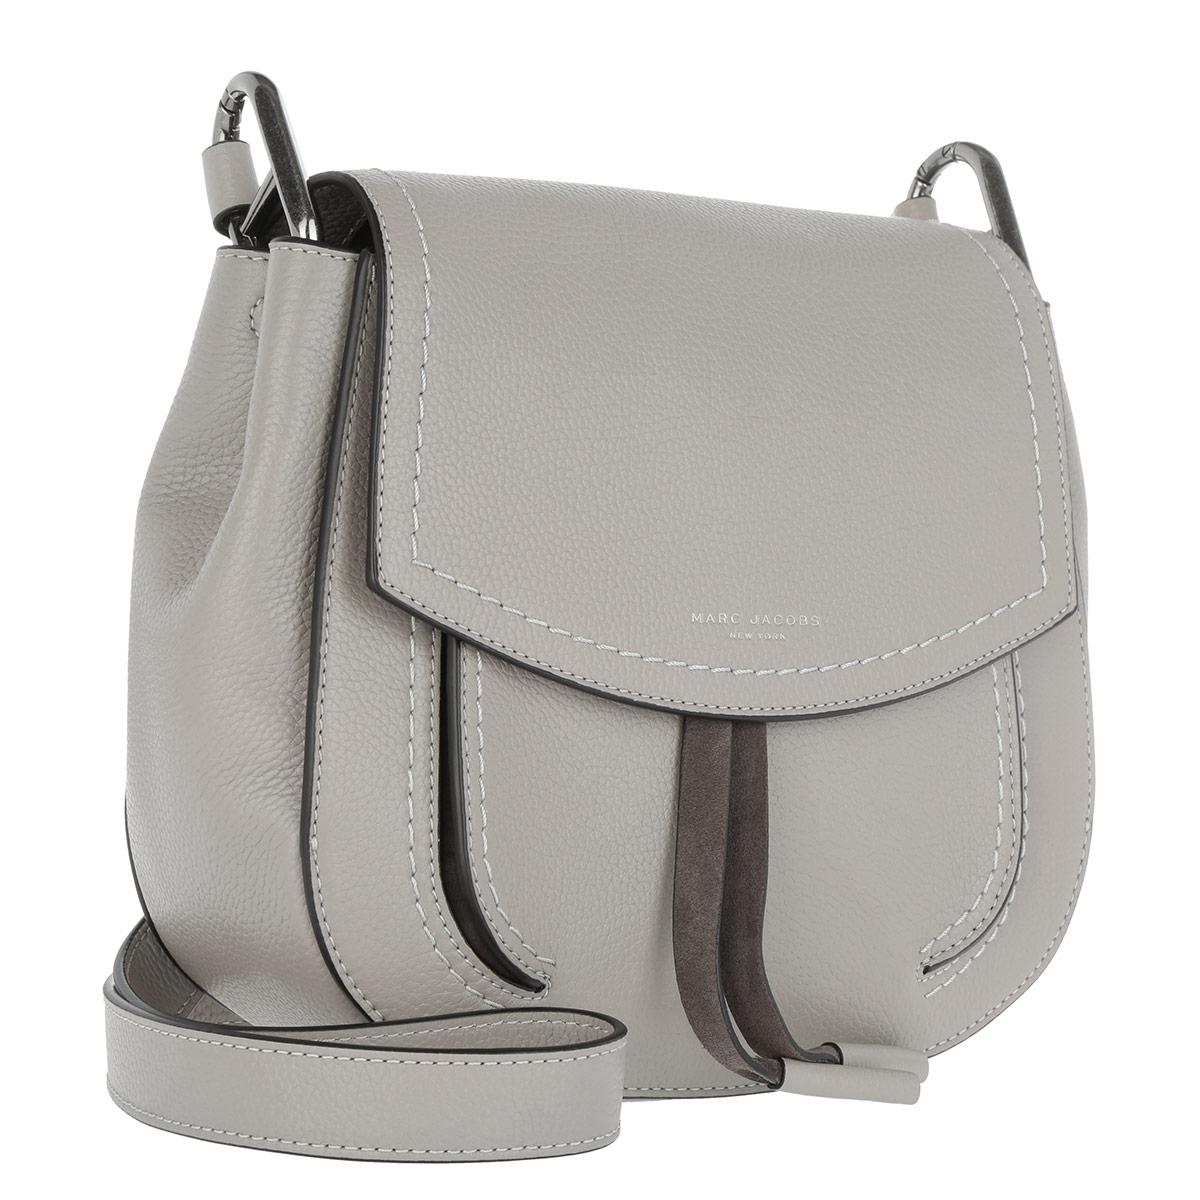 Marc Jacobs Leather Maverick Crossbody Bag Smoke Grey in Grey